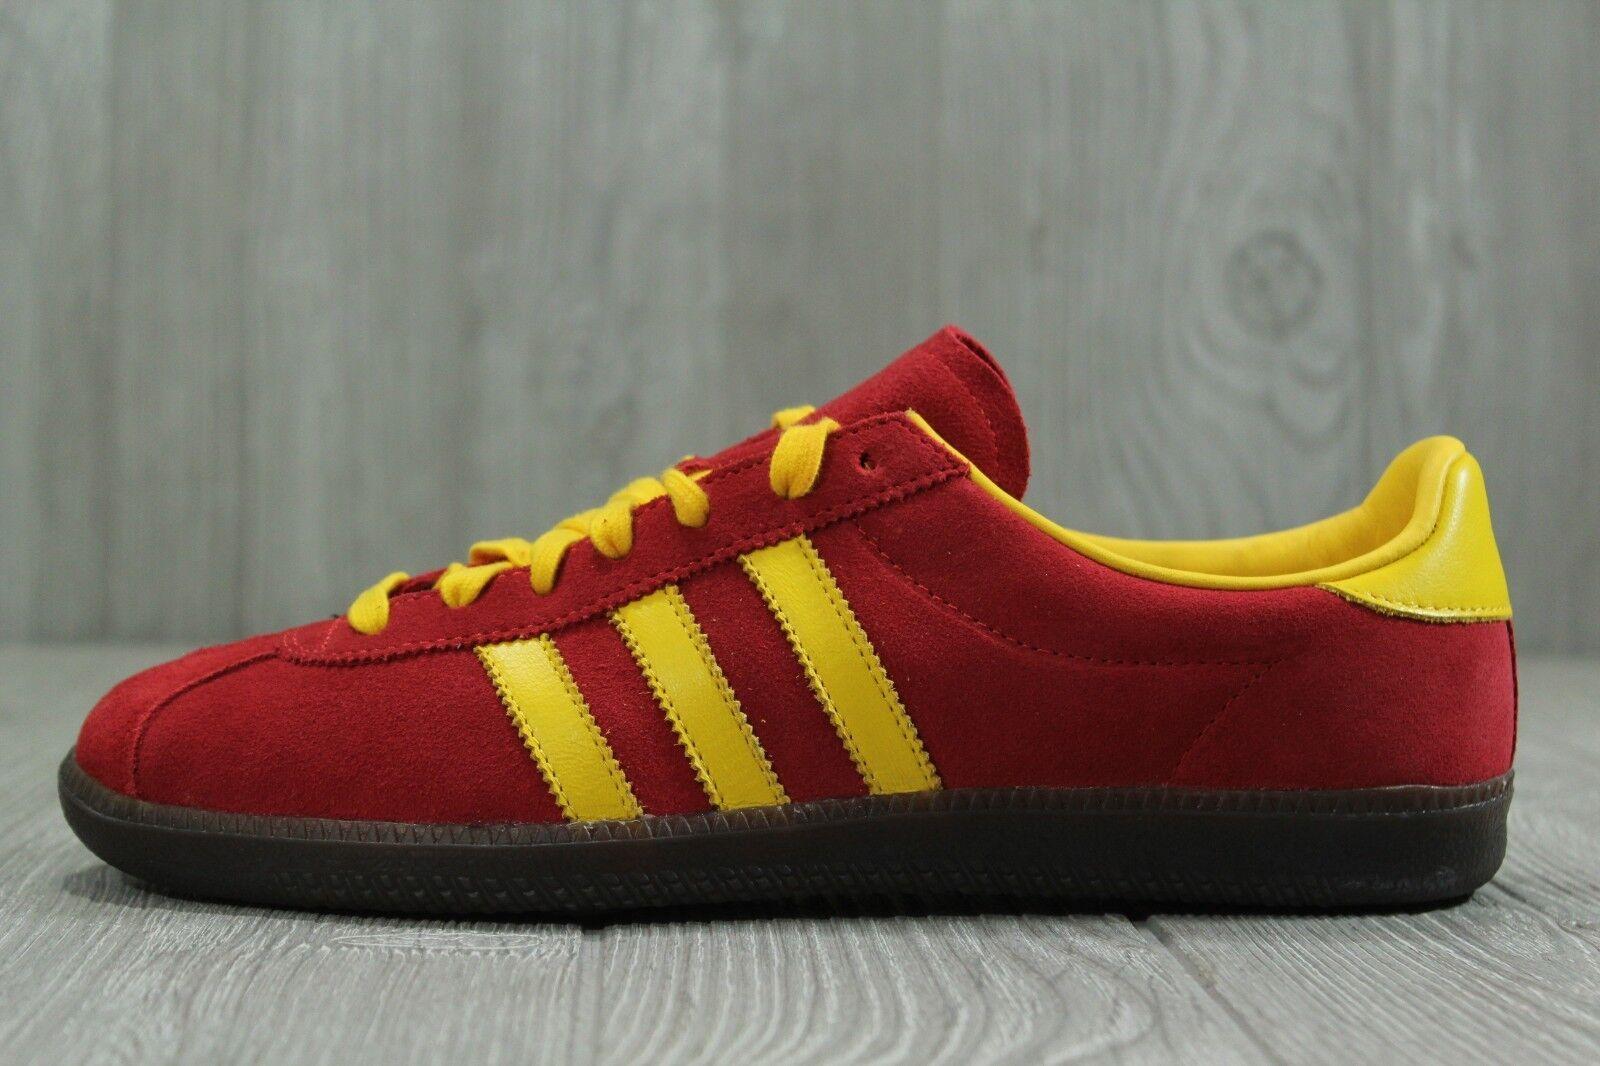 34 Adidas Spiritus Spezial Leather shoes Mens Size 9, 10.5, 12 CG2923